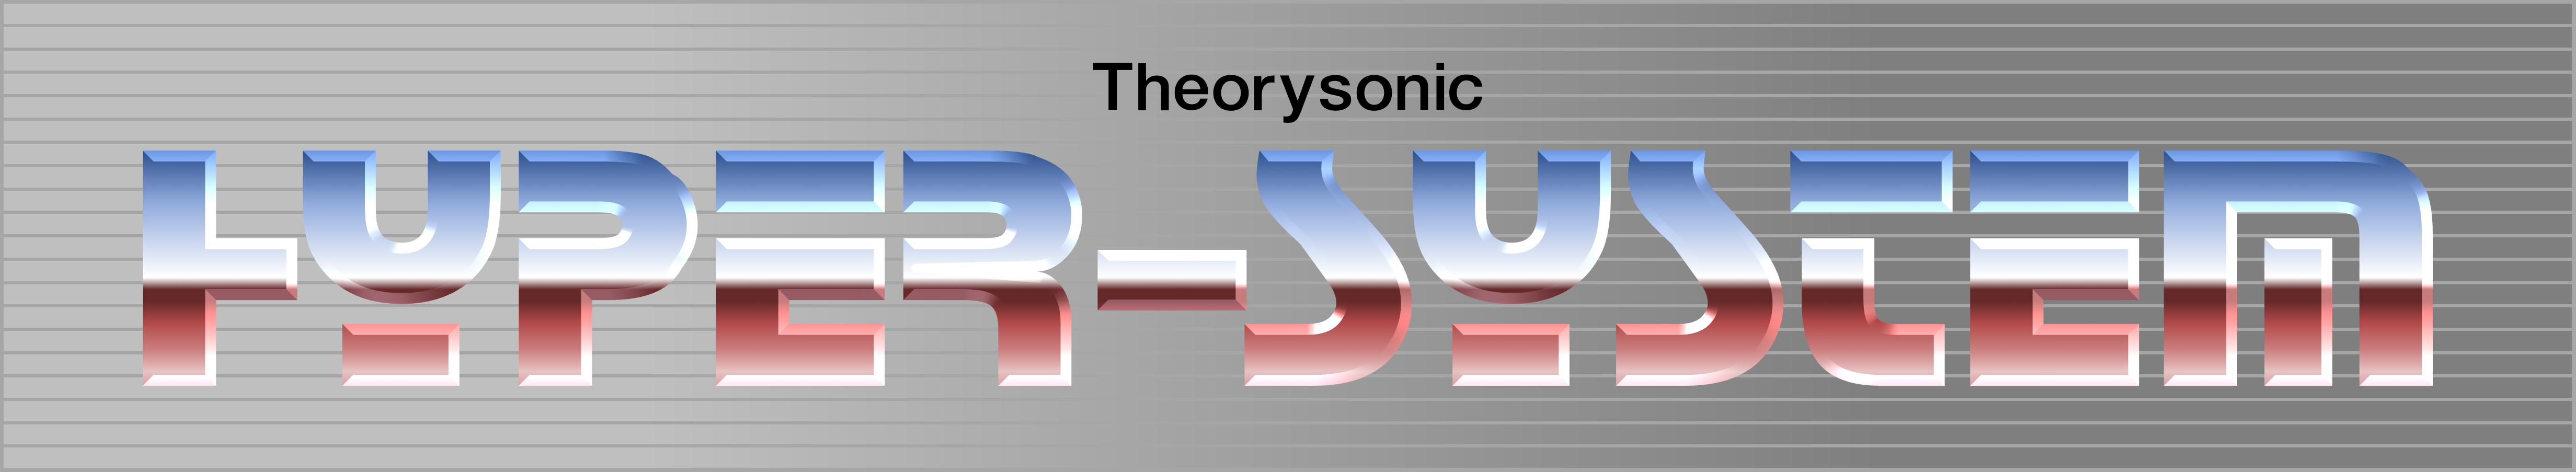 Theorysonic Hyper-System